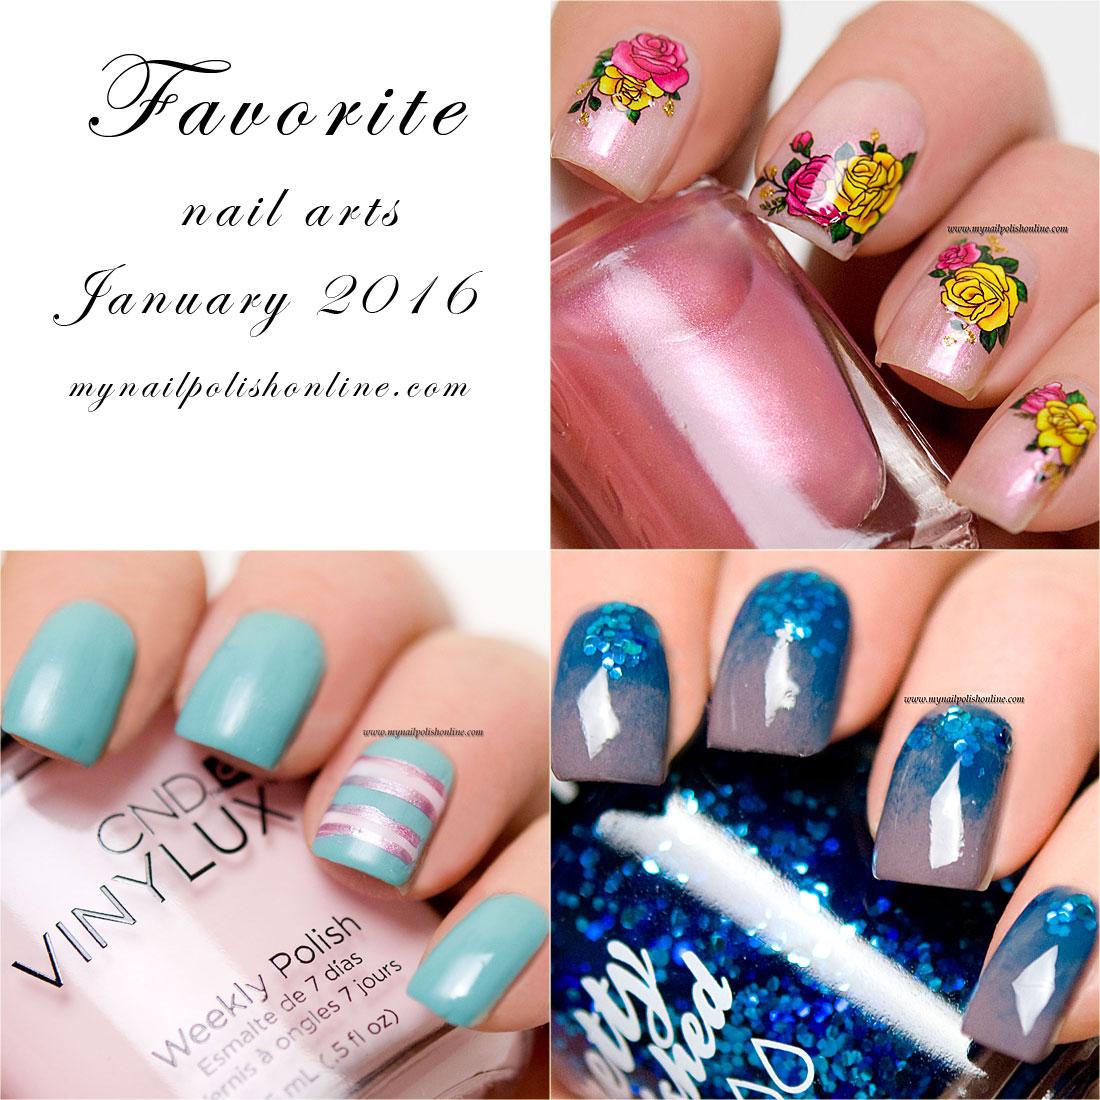 Favorite Nail Art - January 2016